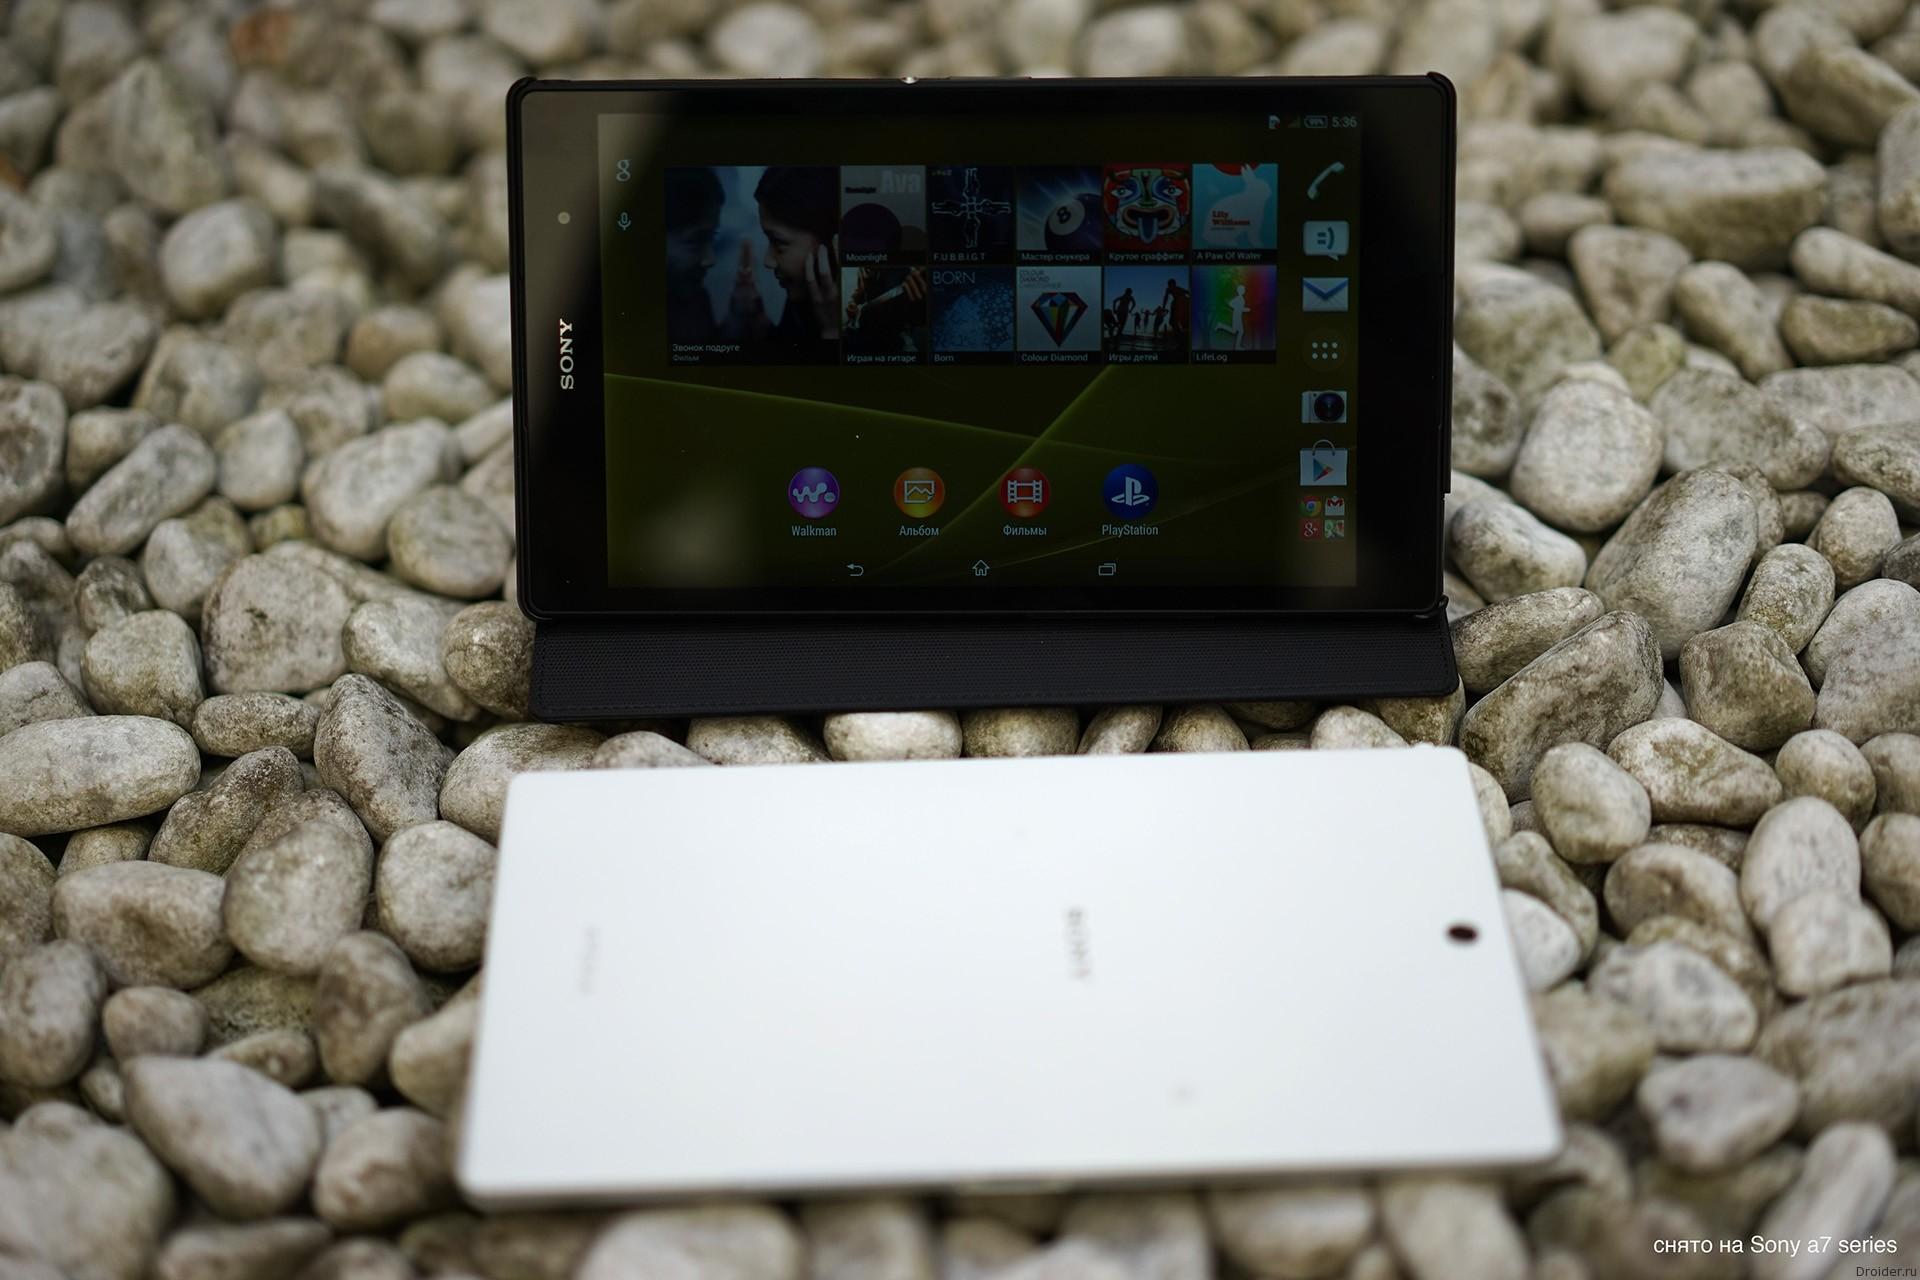 [Первый взгляд] Xperia Z3 Tablet Compact – компактная «таблетка» от Sony